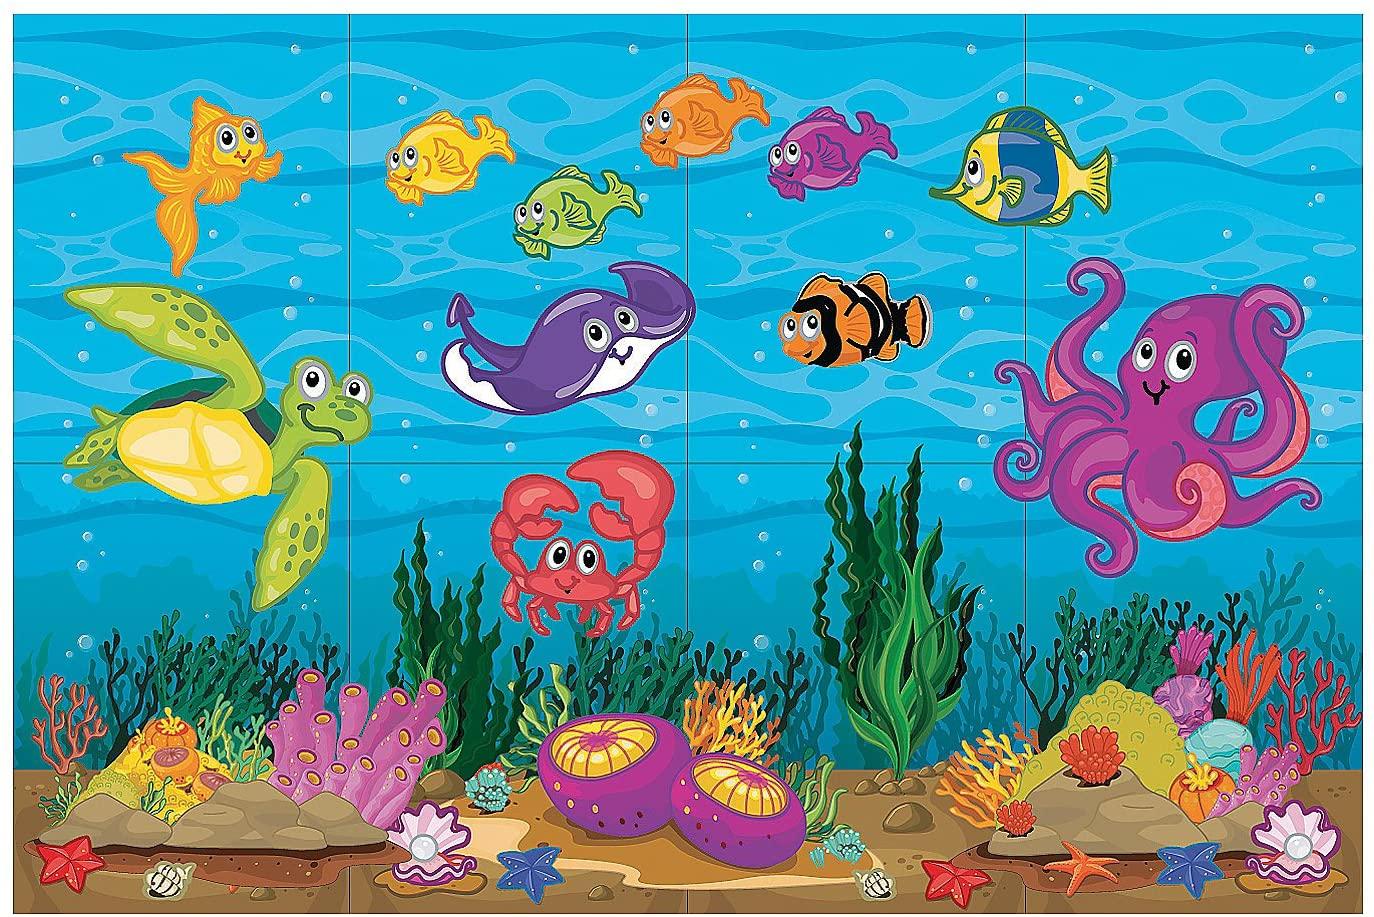 Fun Express - Under The Sea Dar Set - Party Decor - Wall Decor - Scene Setters - 4 Pieces